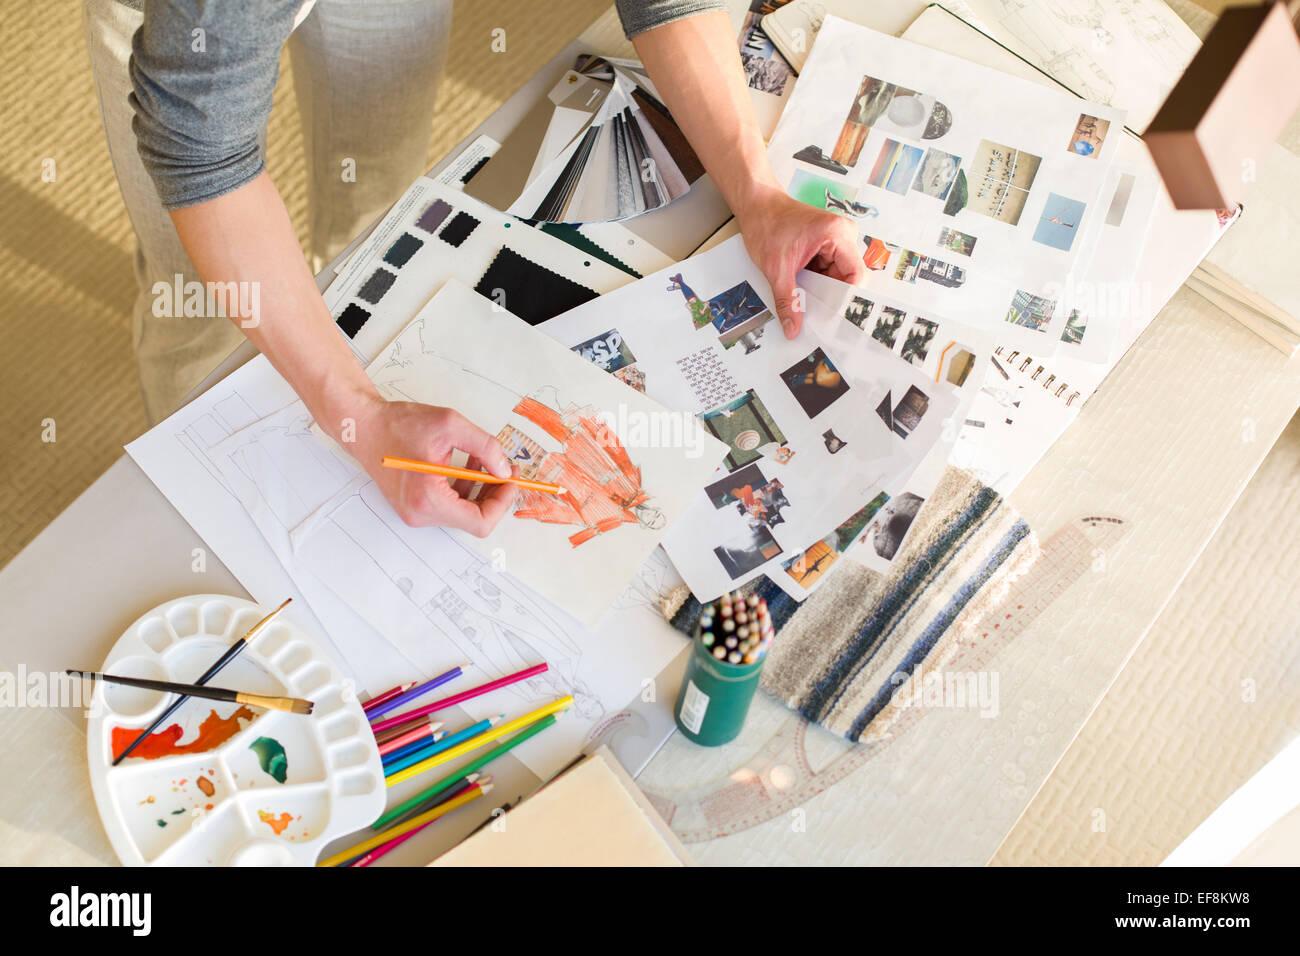 Diseñador de moda boceto dibujo Imagen De Stock